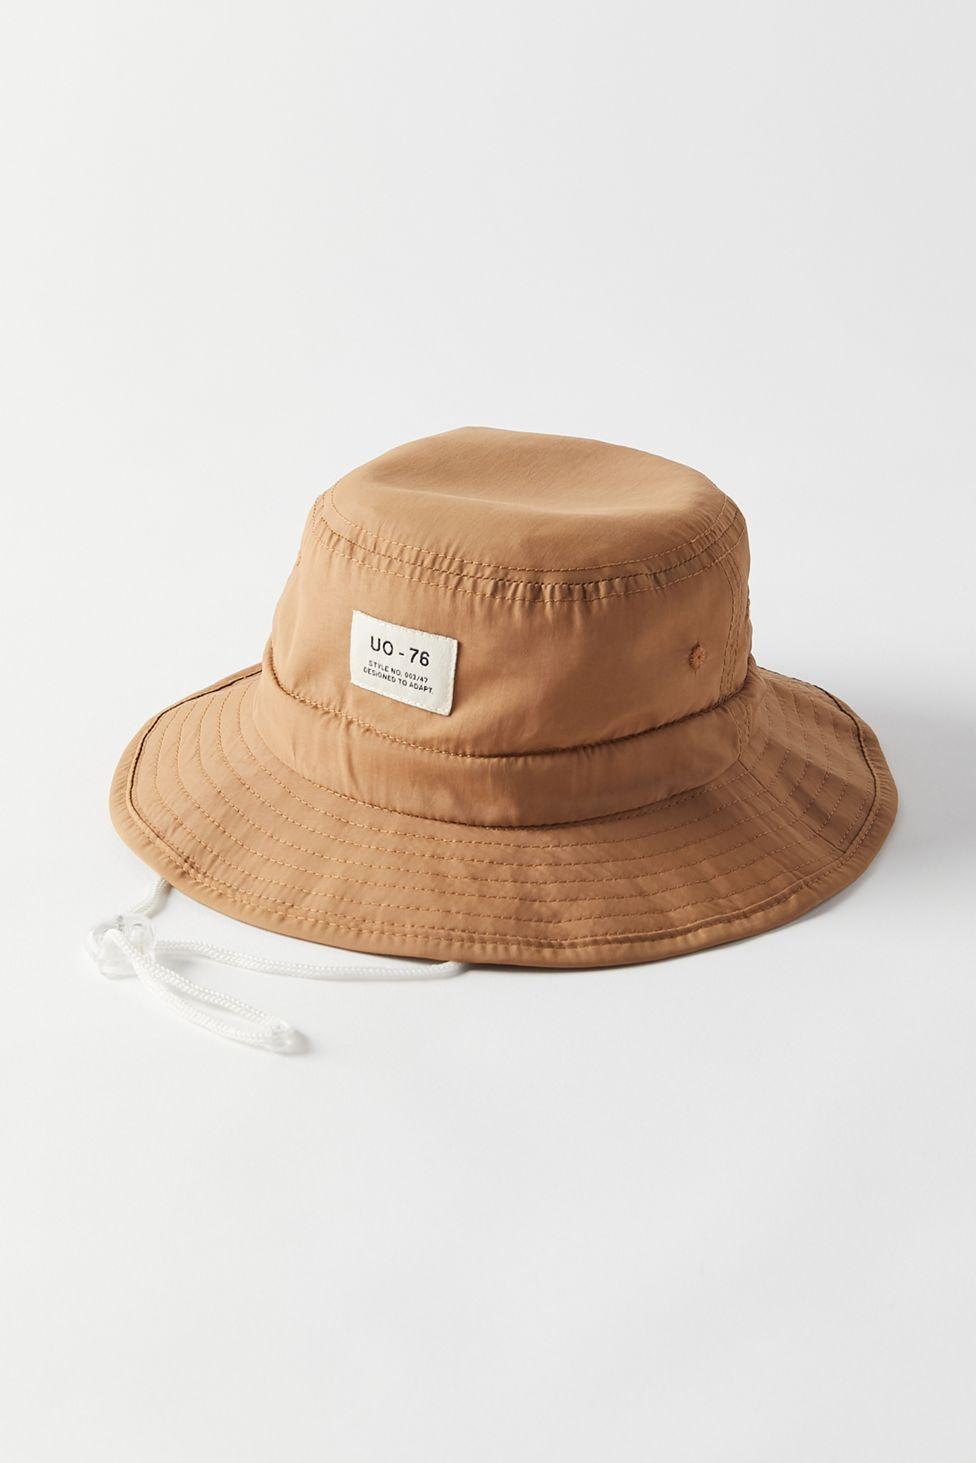 Uo Safari Drawstring Bucket Hat Fischerhut